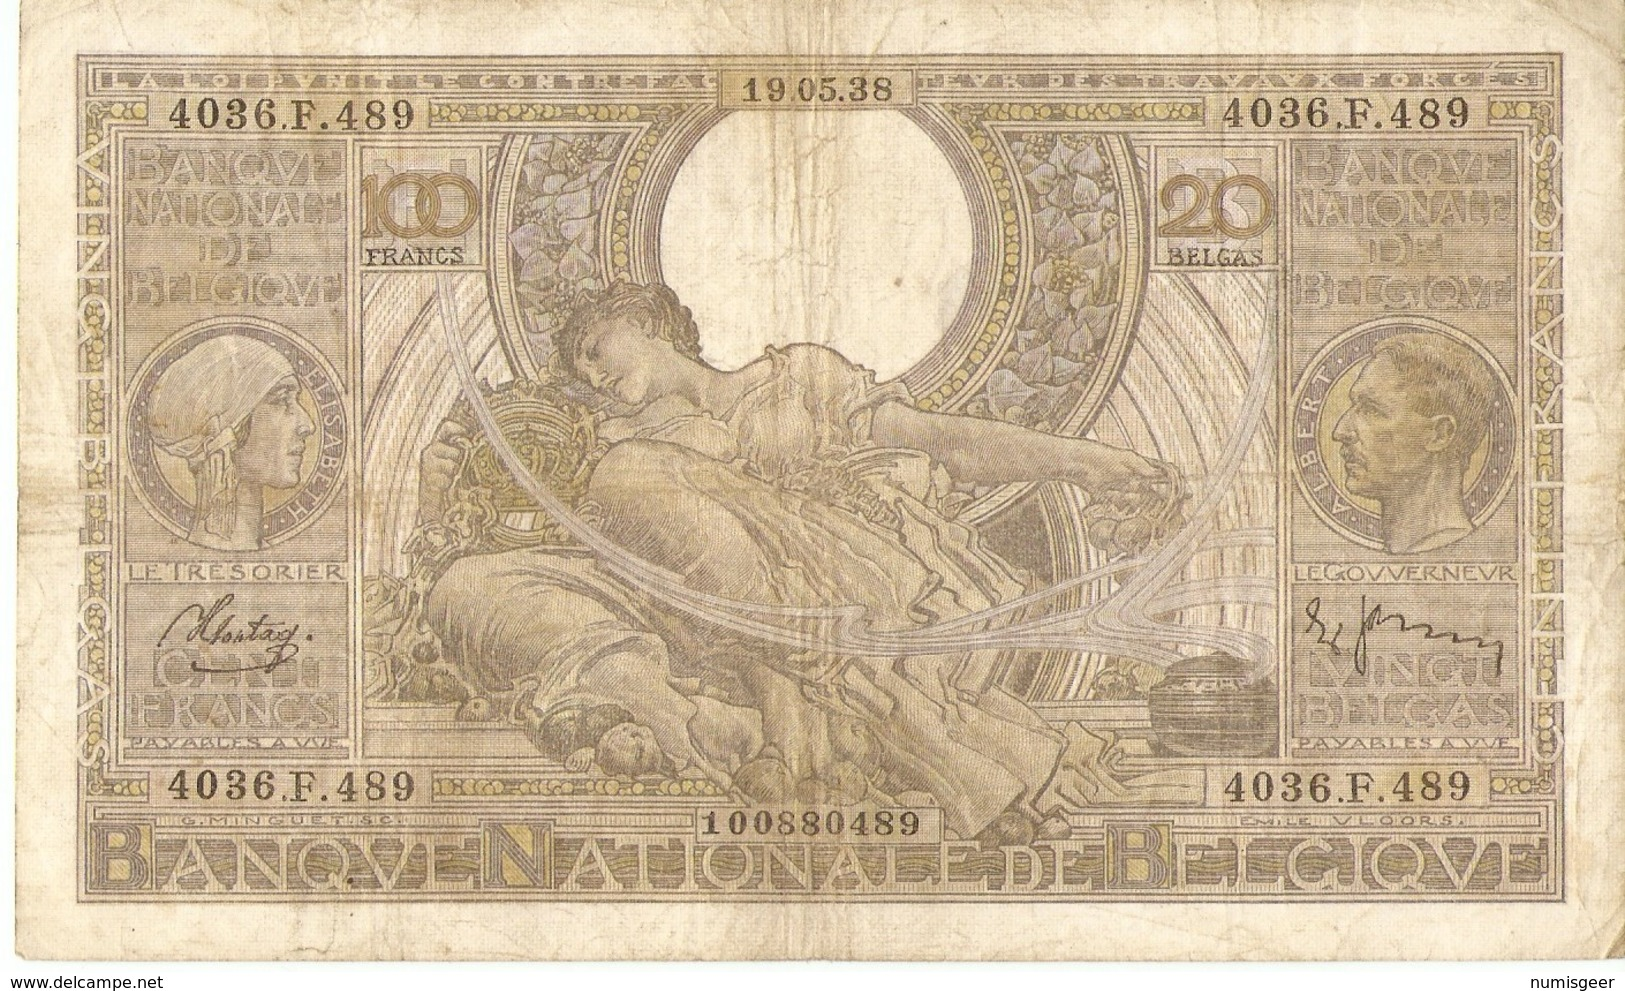 BELGIQUE -- 100 F. ( 20 Belgas ) N° -  4036.F.489 - [ 2] 1831-... : Regno Del Belgio